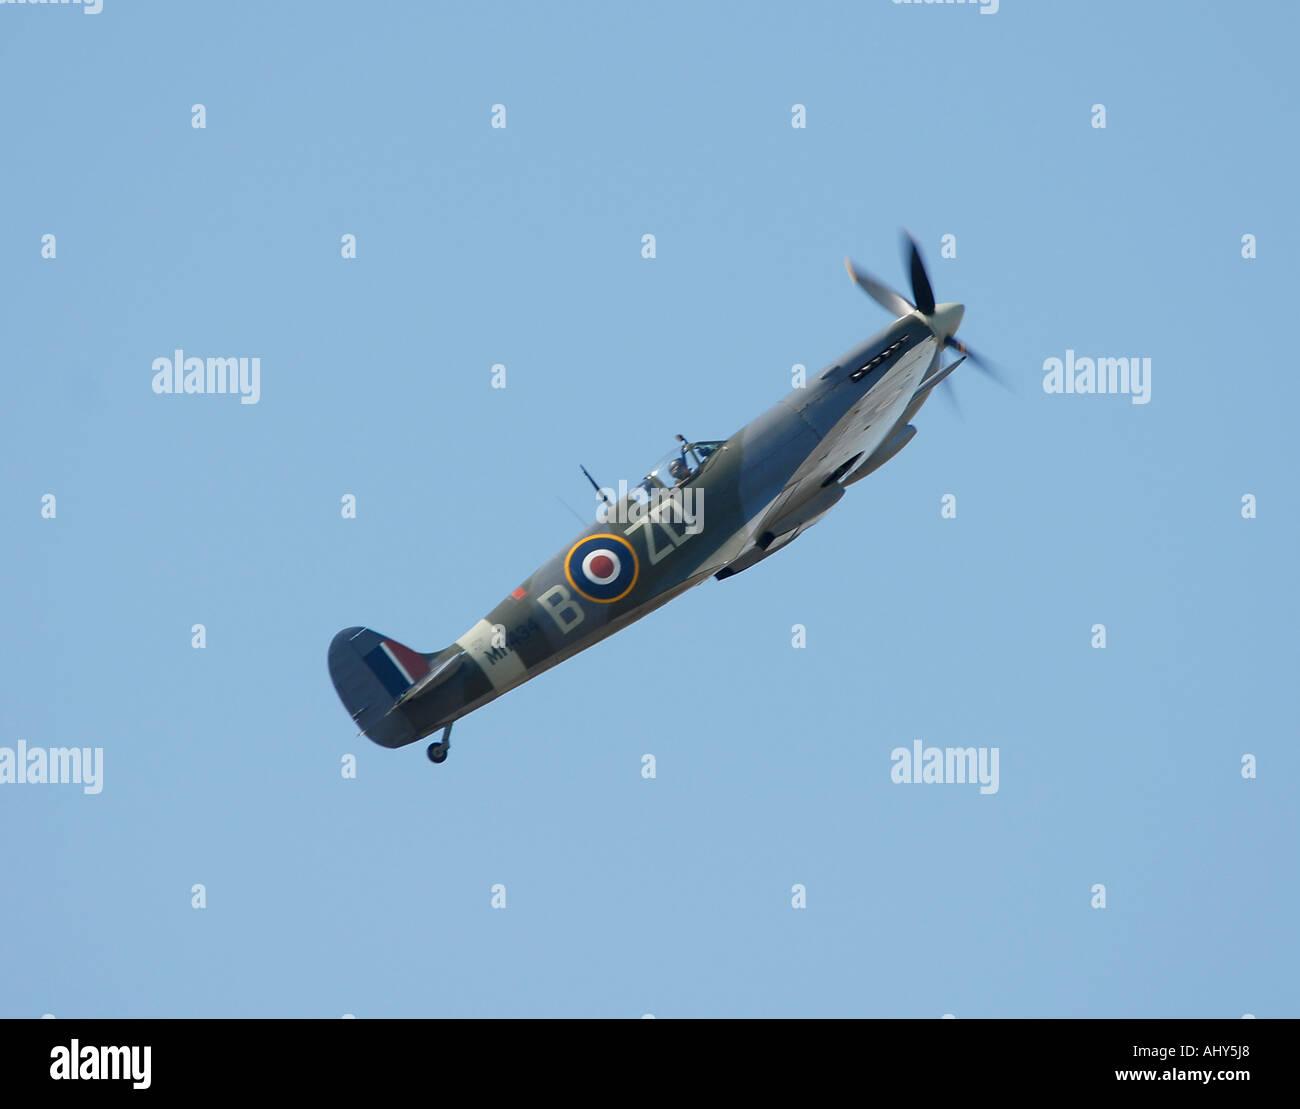 Spitfire performs aerobatics over Goodwood - Stock Image